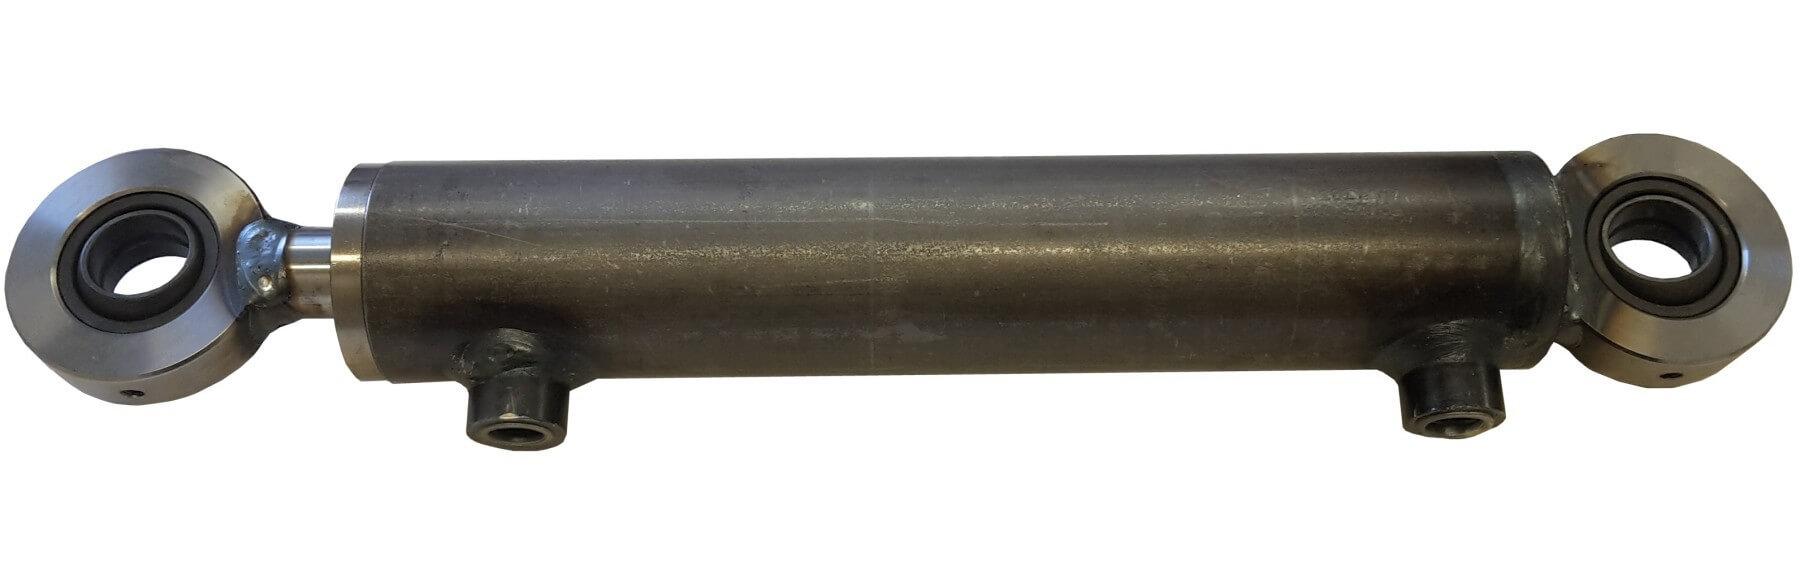 Hydraulisylinteri CL 80. 50. 400 GE